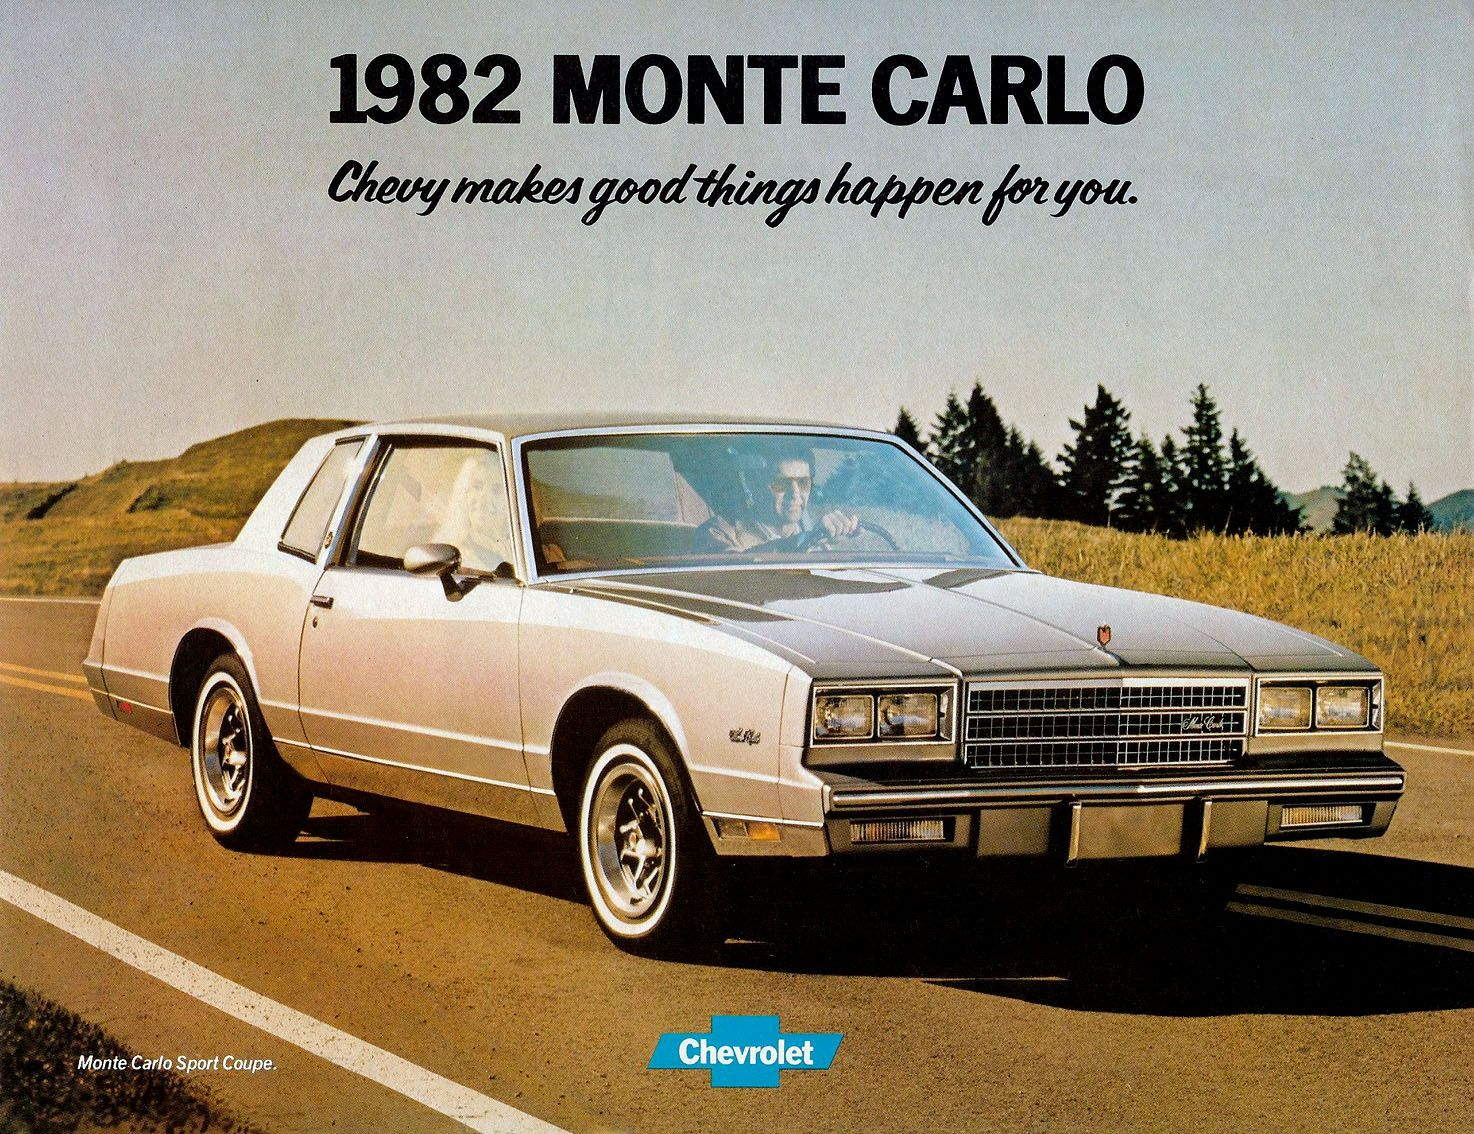 1982 chevrolet monte carlo chevrolet monte carlo pinterest rh pinterest com 1982 chevy monte carlo vapor canister 1982 chevy monte carlo for sale